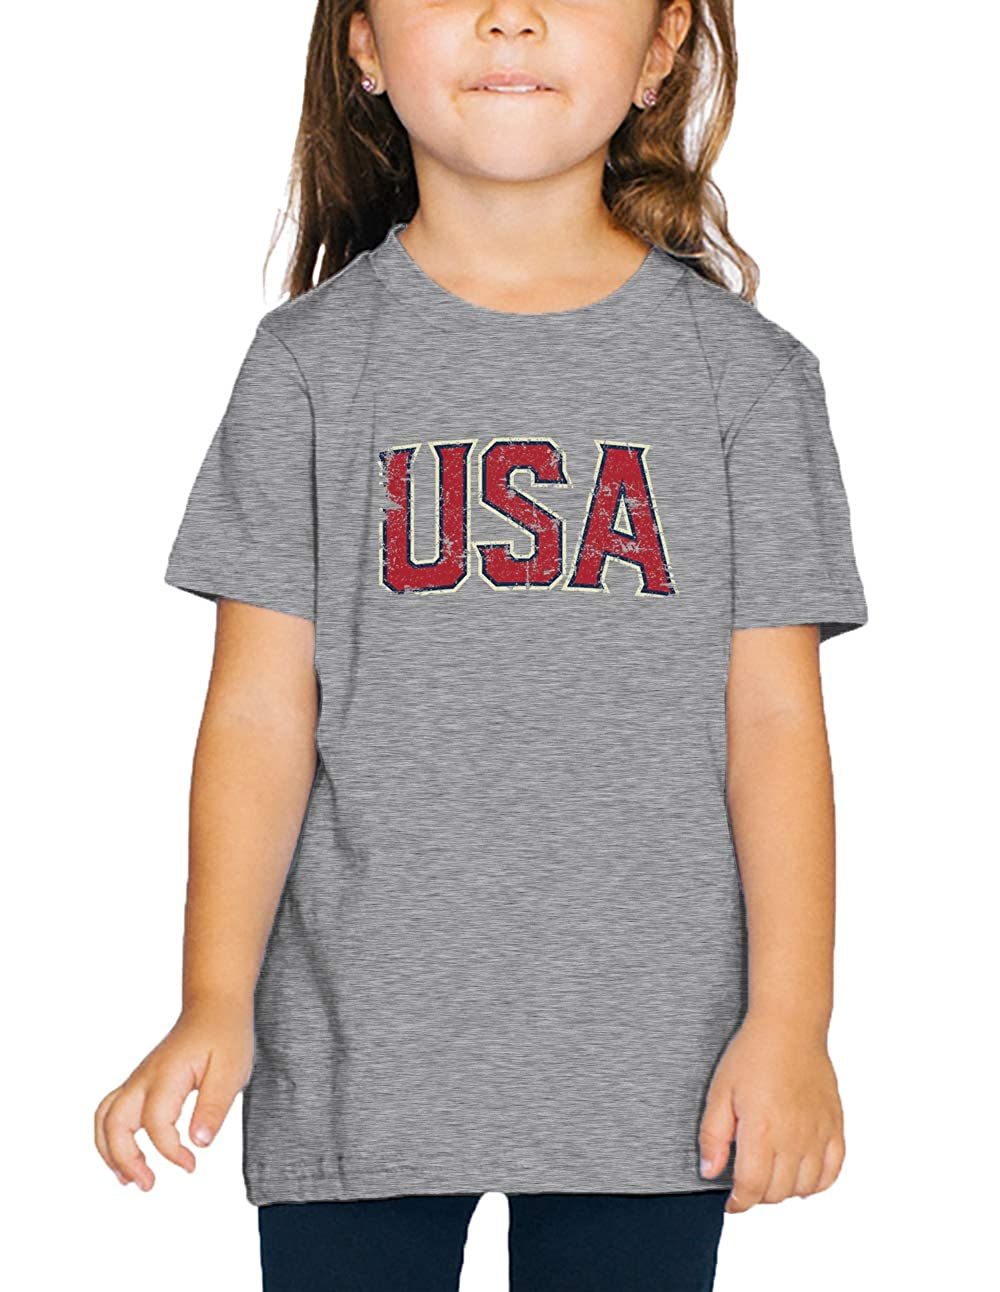 Light Gray 2T SpiritForged Apparel Vintage USA Patriotic America Toddler T-Shirt